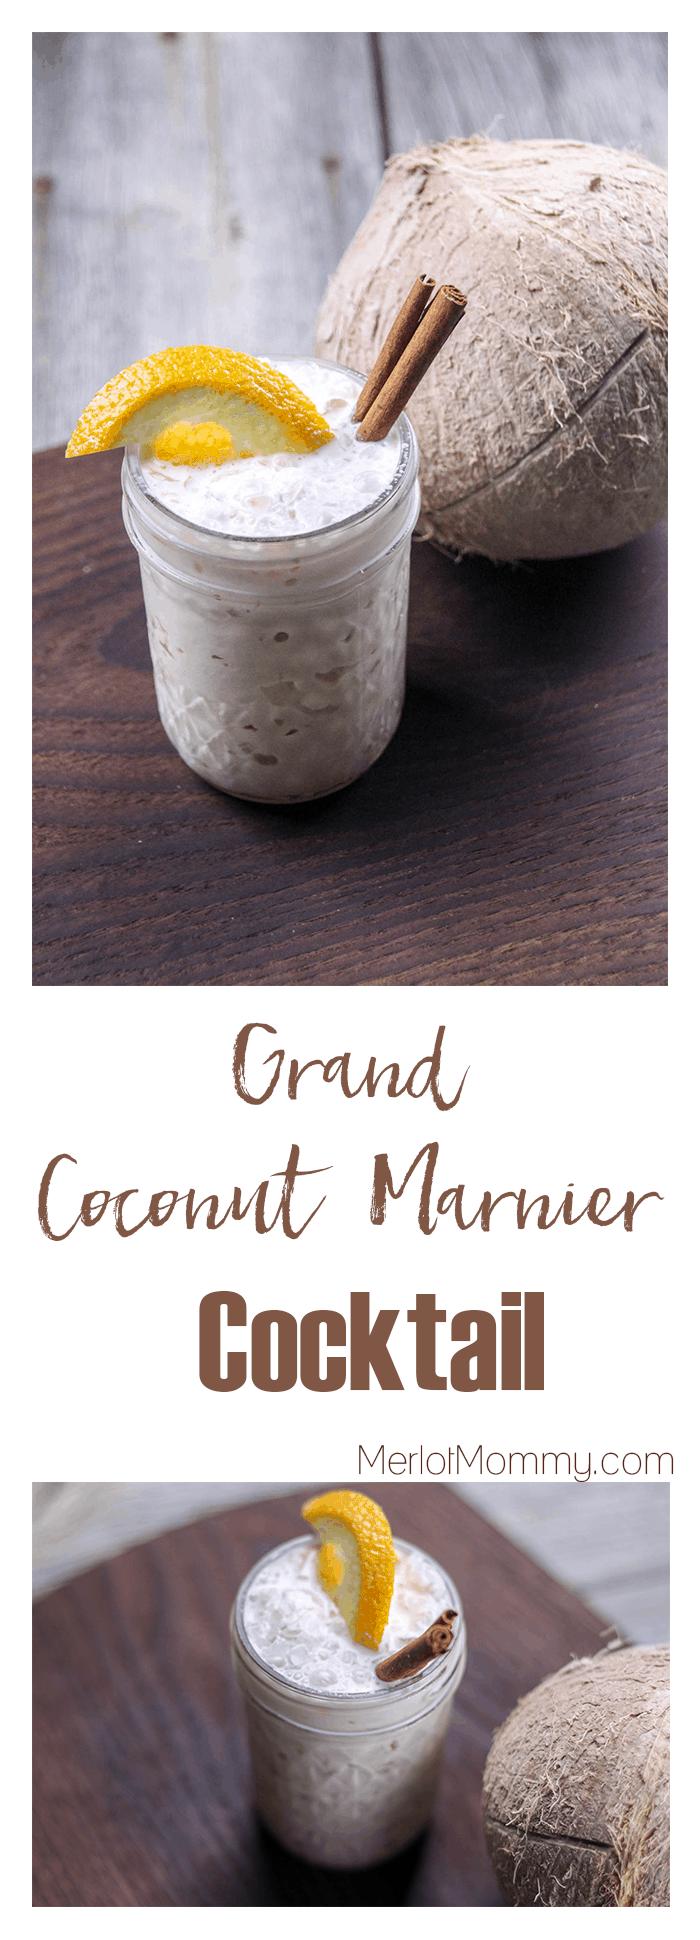 Moana Cocktail - Grand Coconut Marnier Cocktail